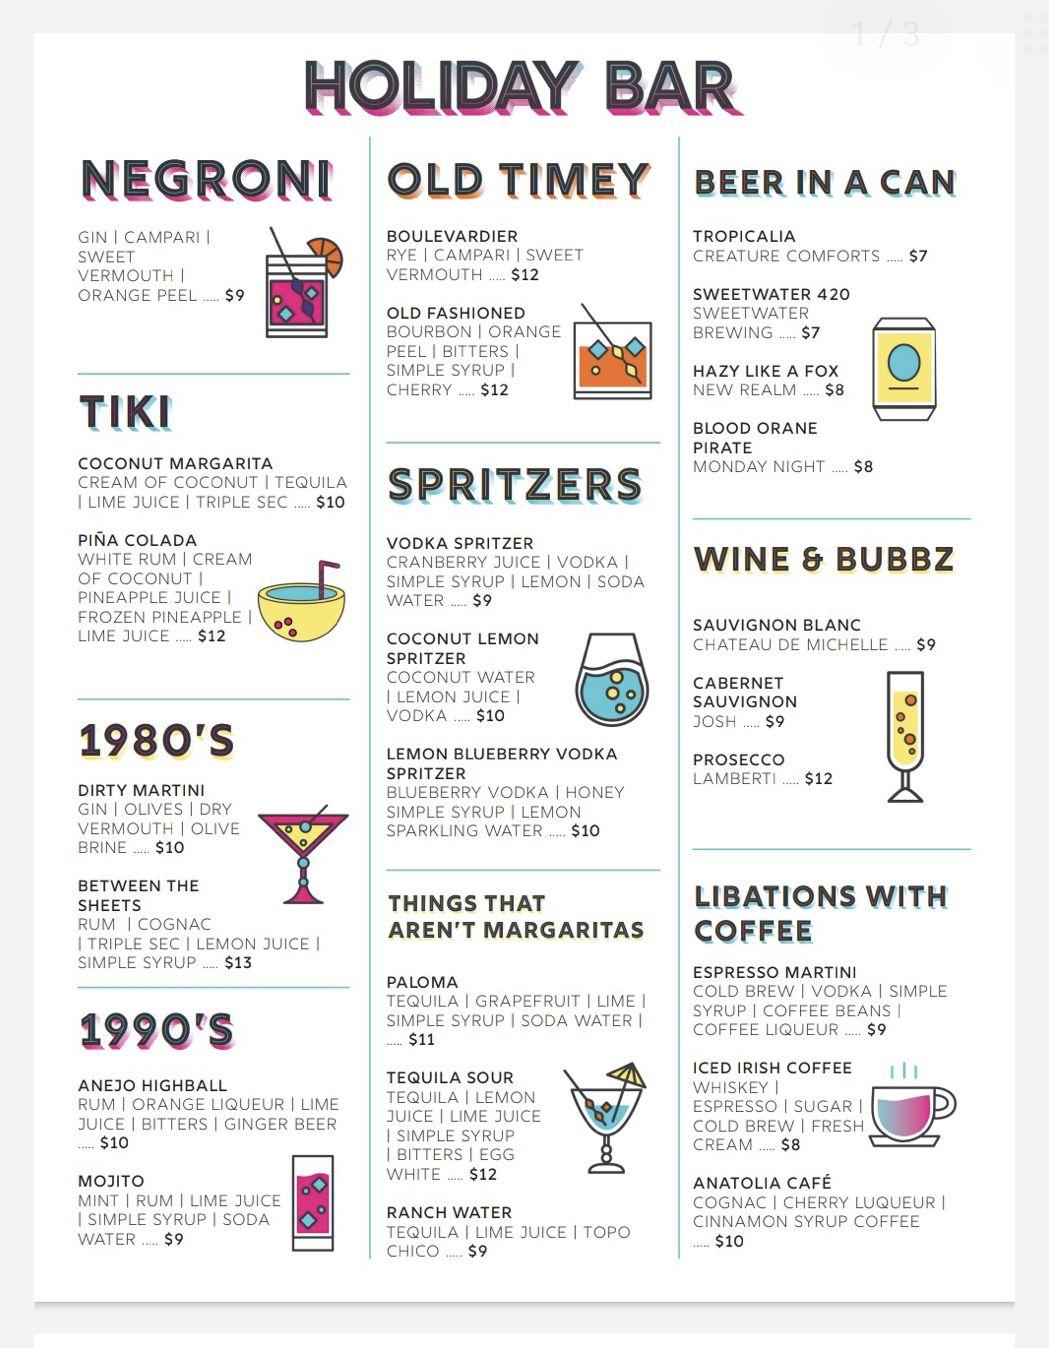 Sample cocktail menu from the Holiday Bar website in Atlanta, GA